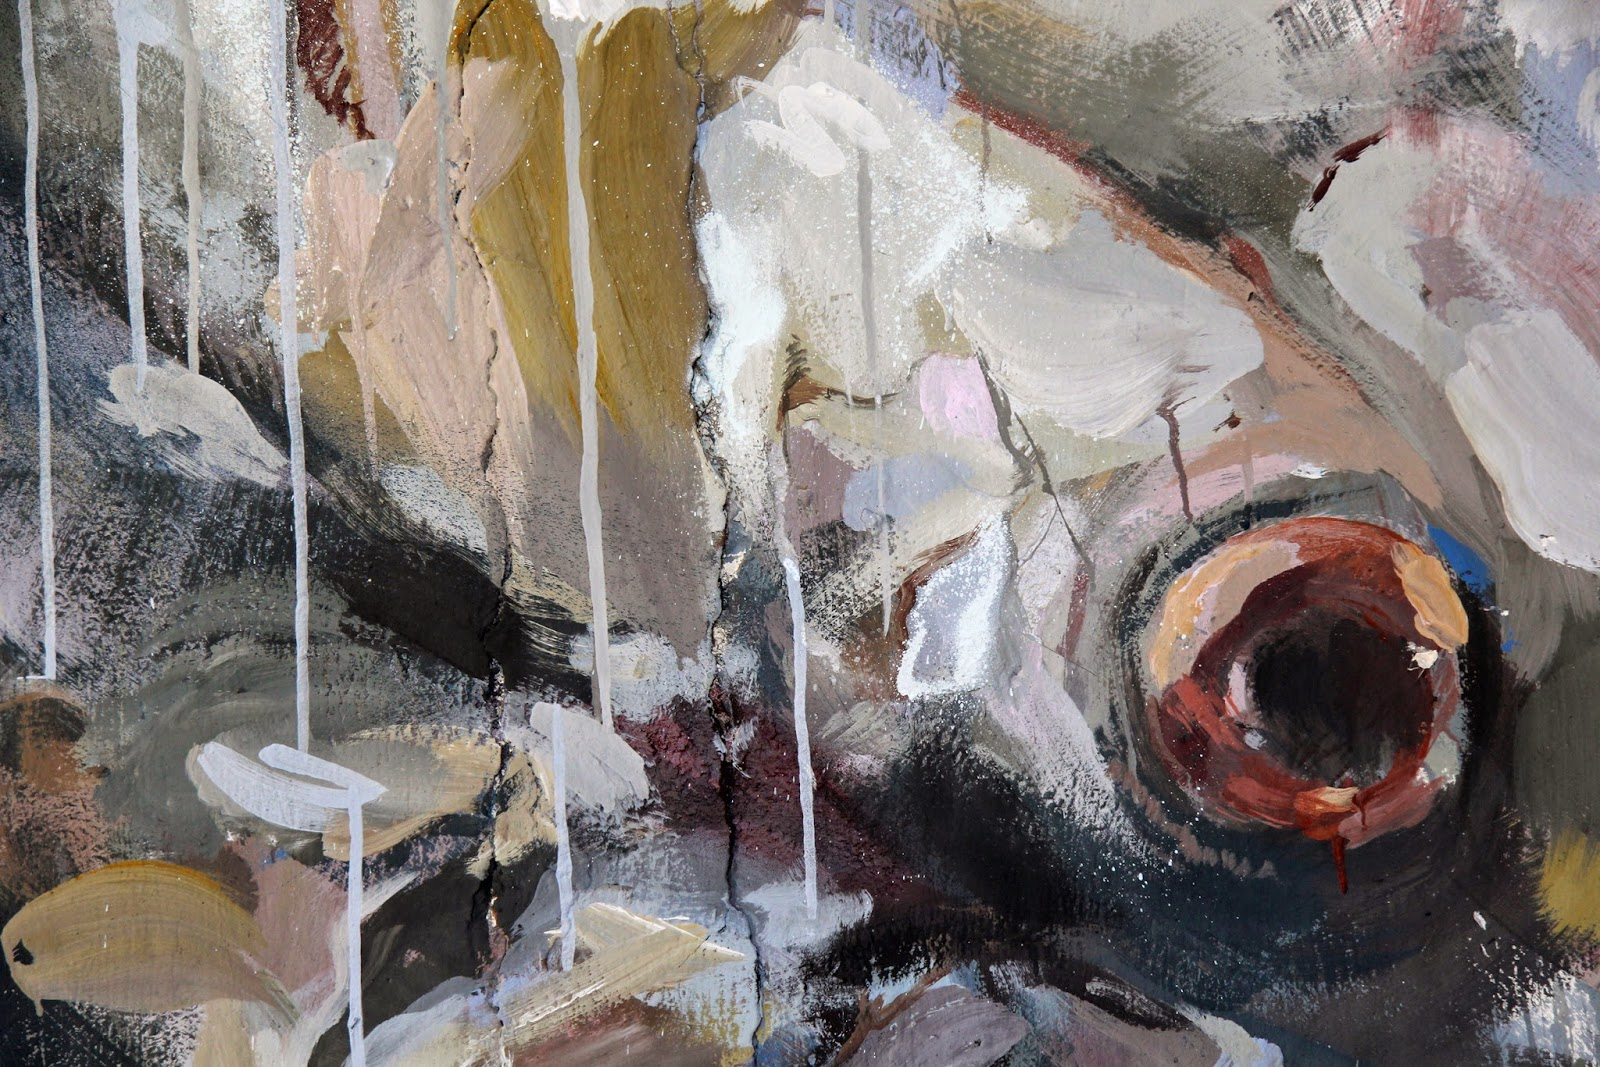 laguna-emilio-cerezo-xabier-xtrm-new-mural-03